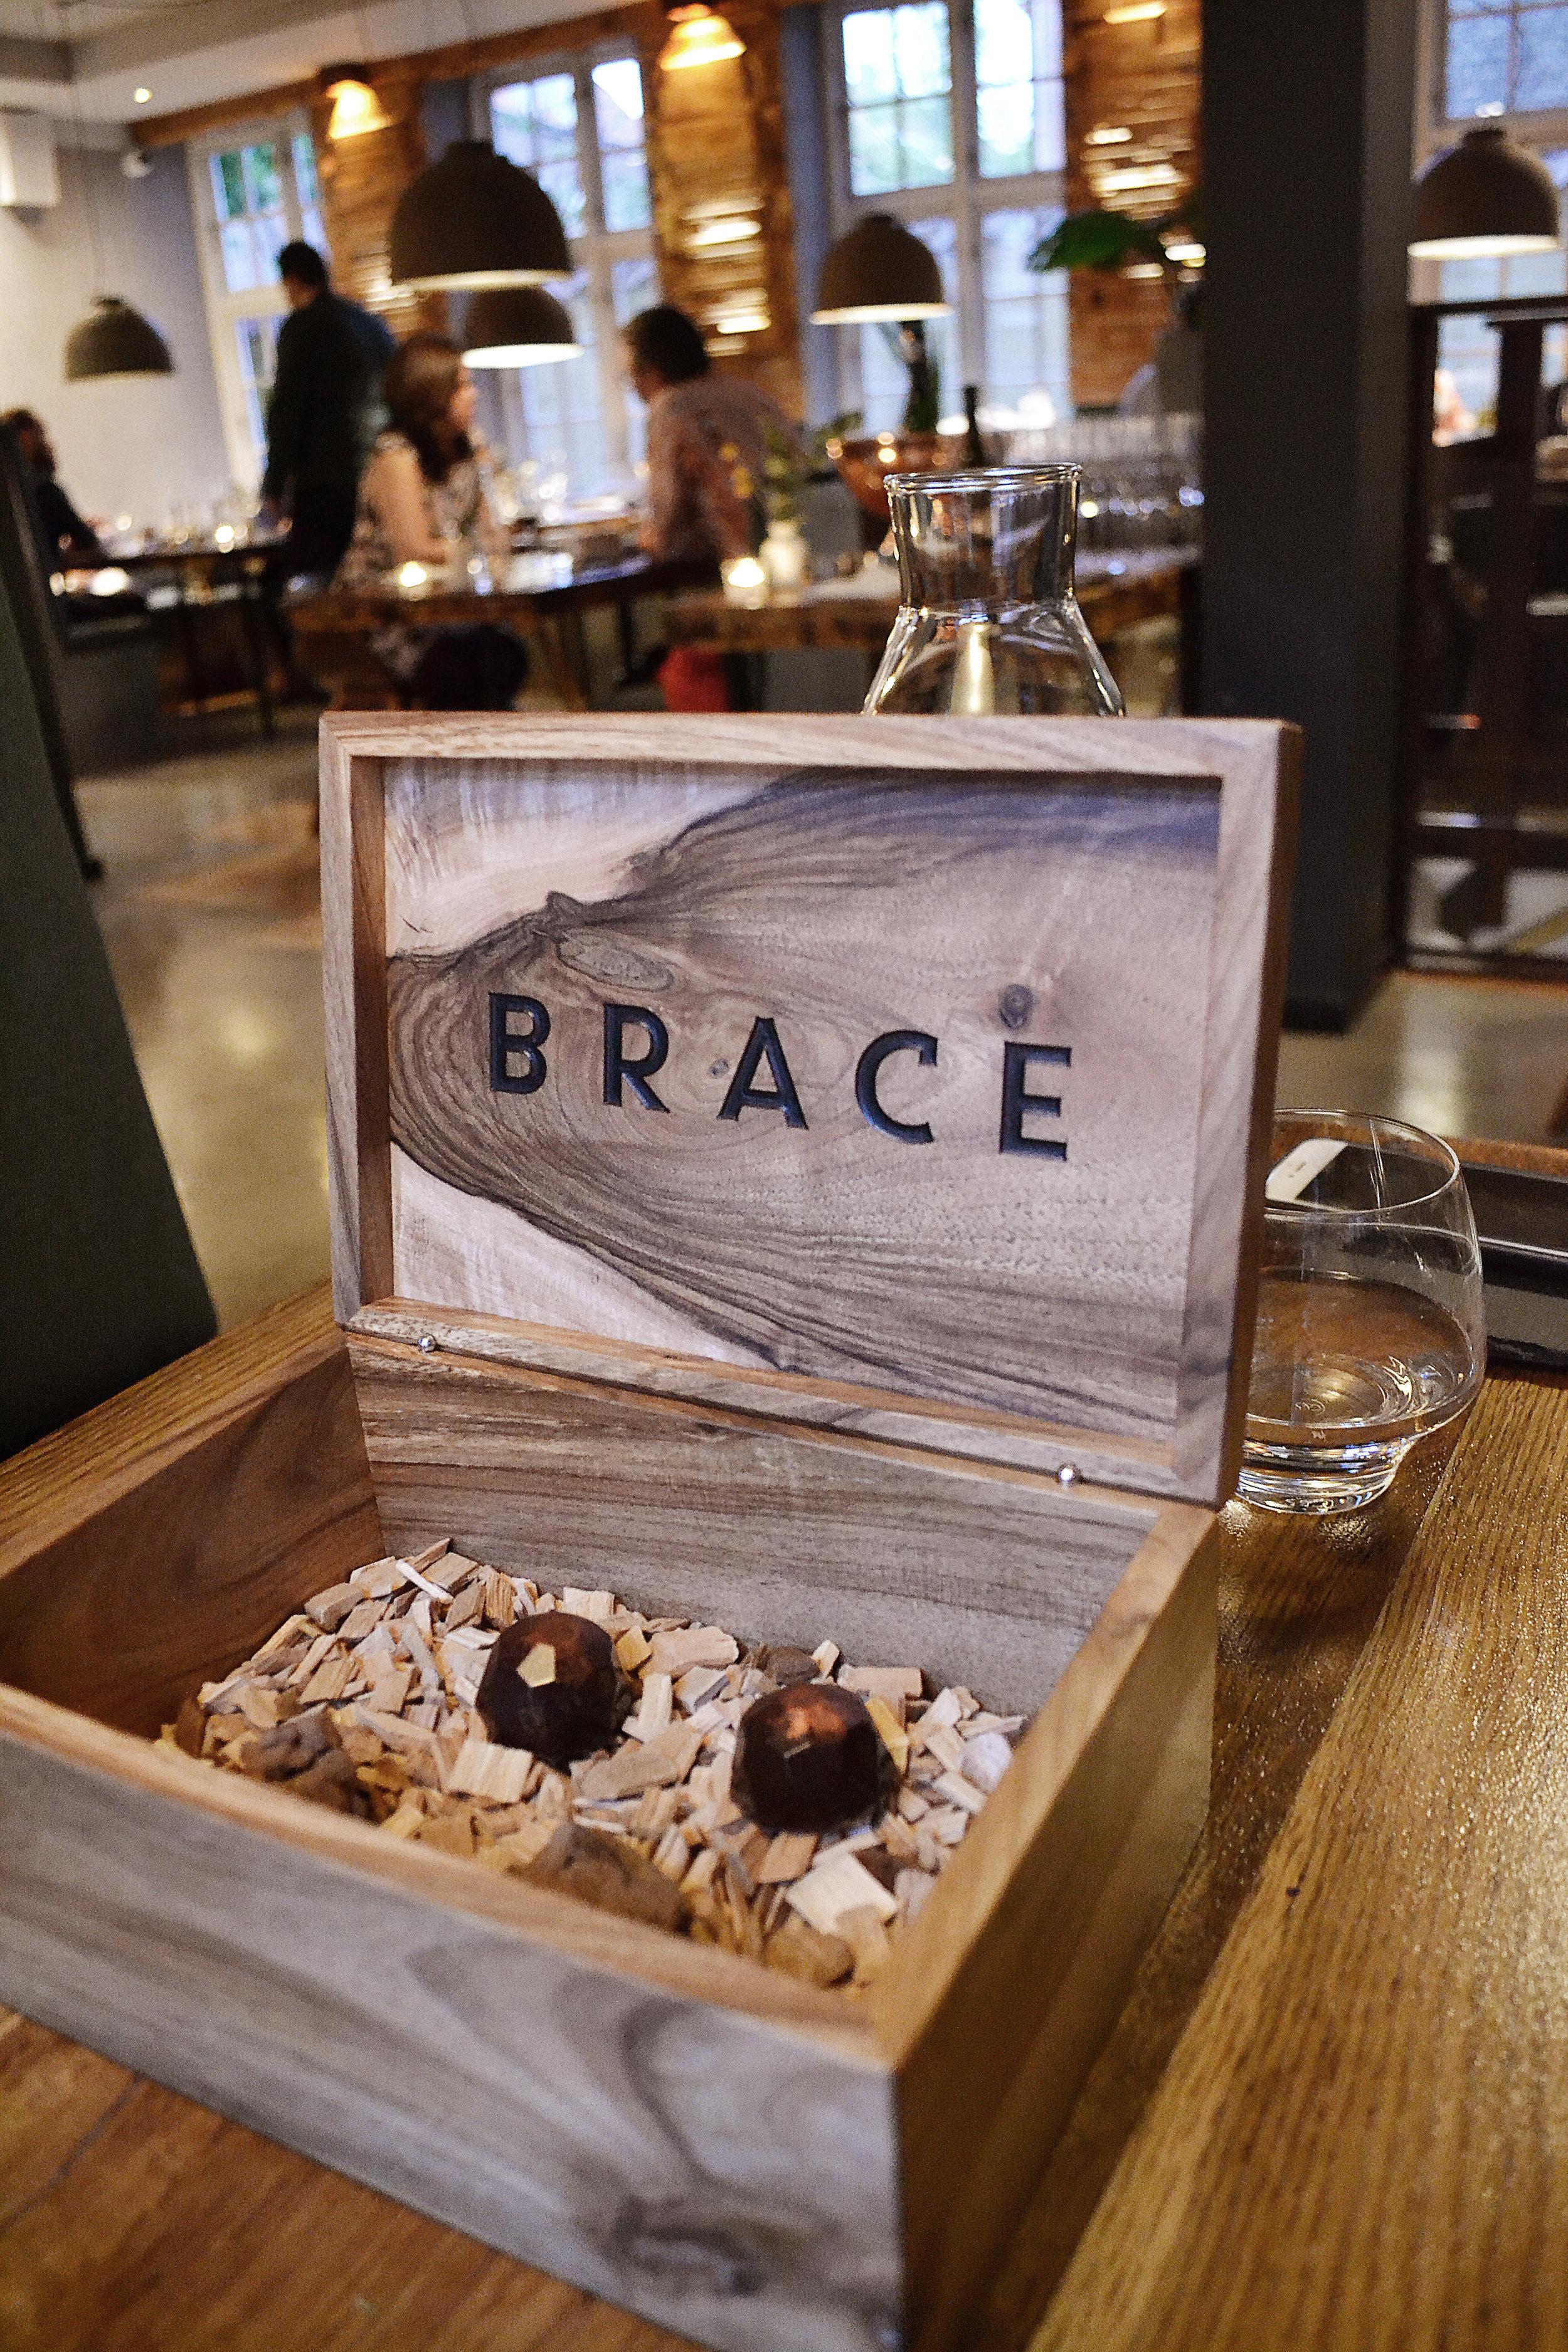 StudioGabrielle_Guide_Copenhagen_StylistEye_Brace_ItalianNordic_Restaurant